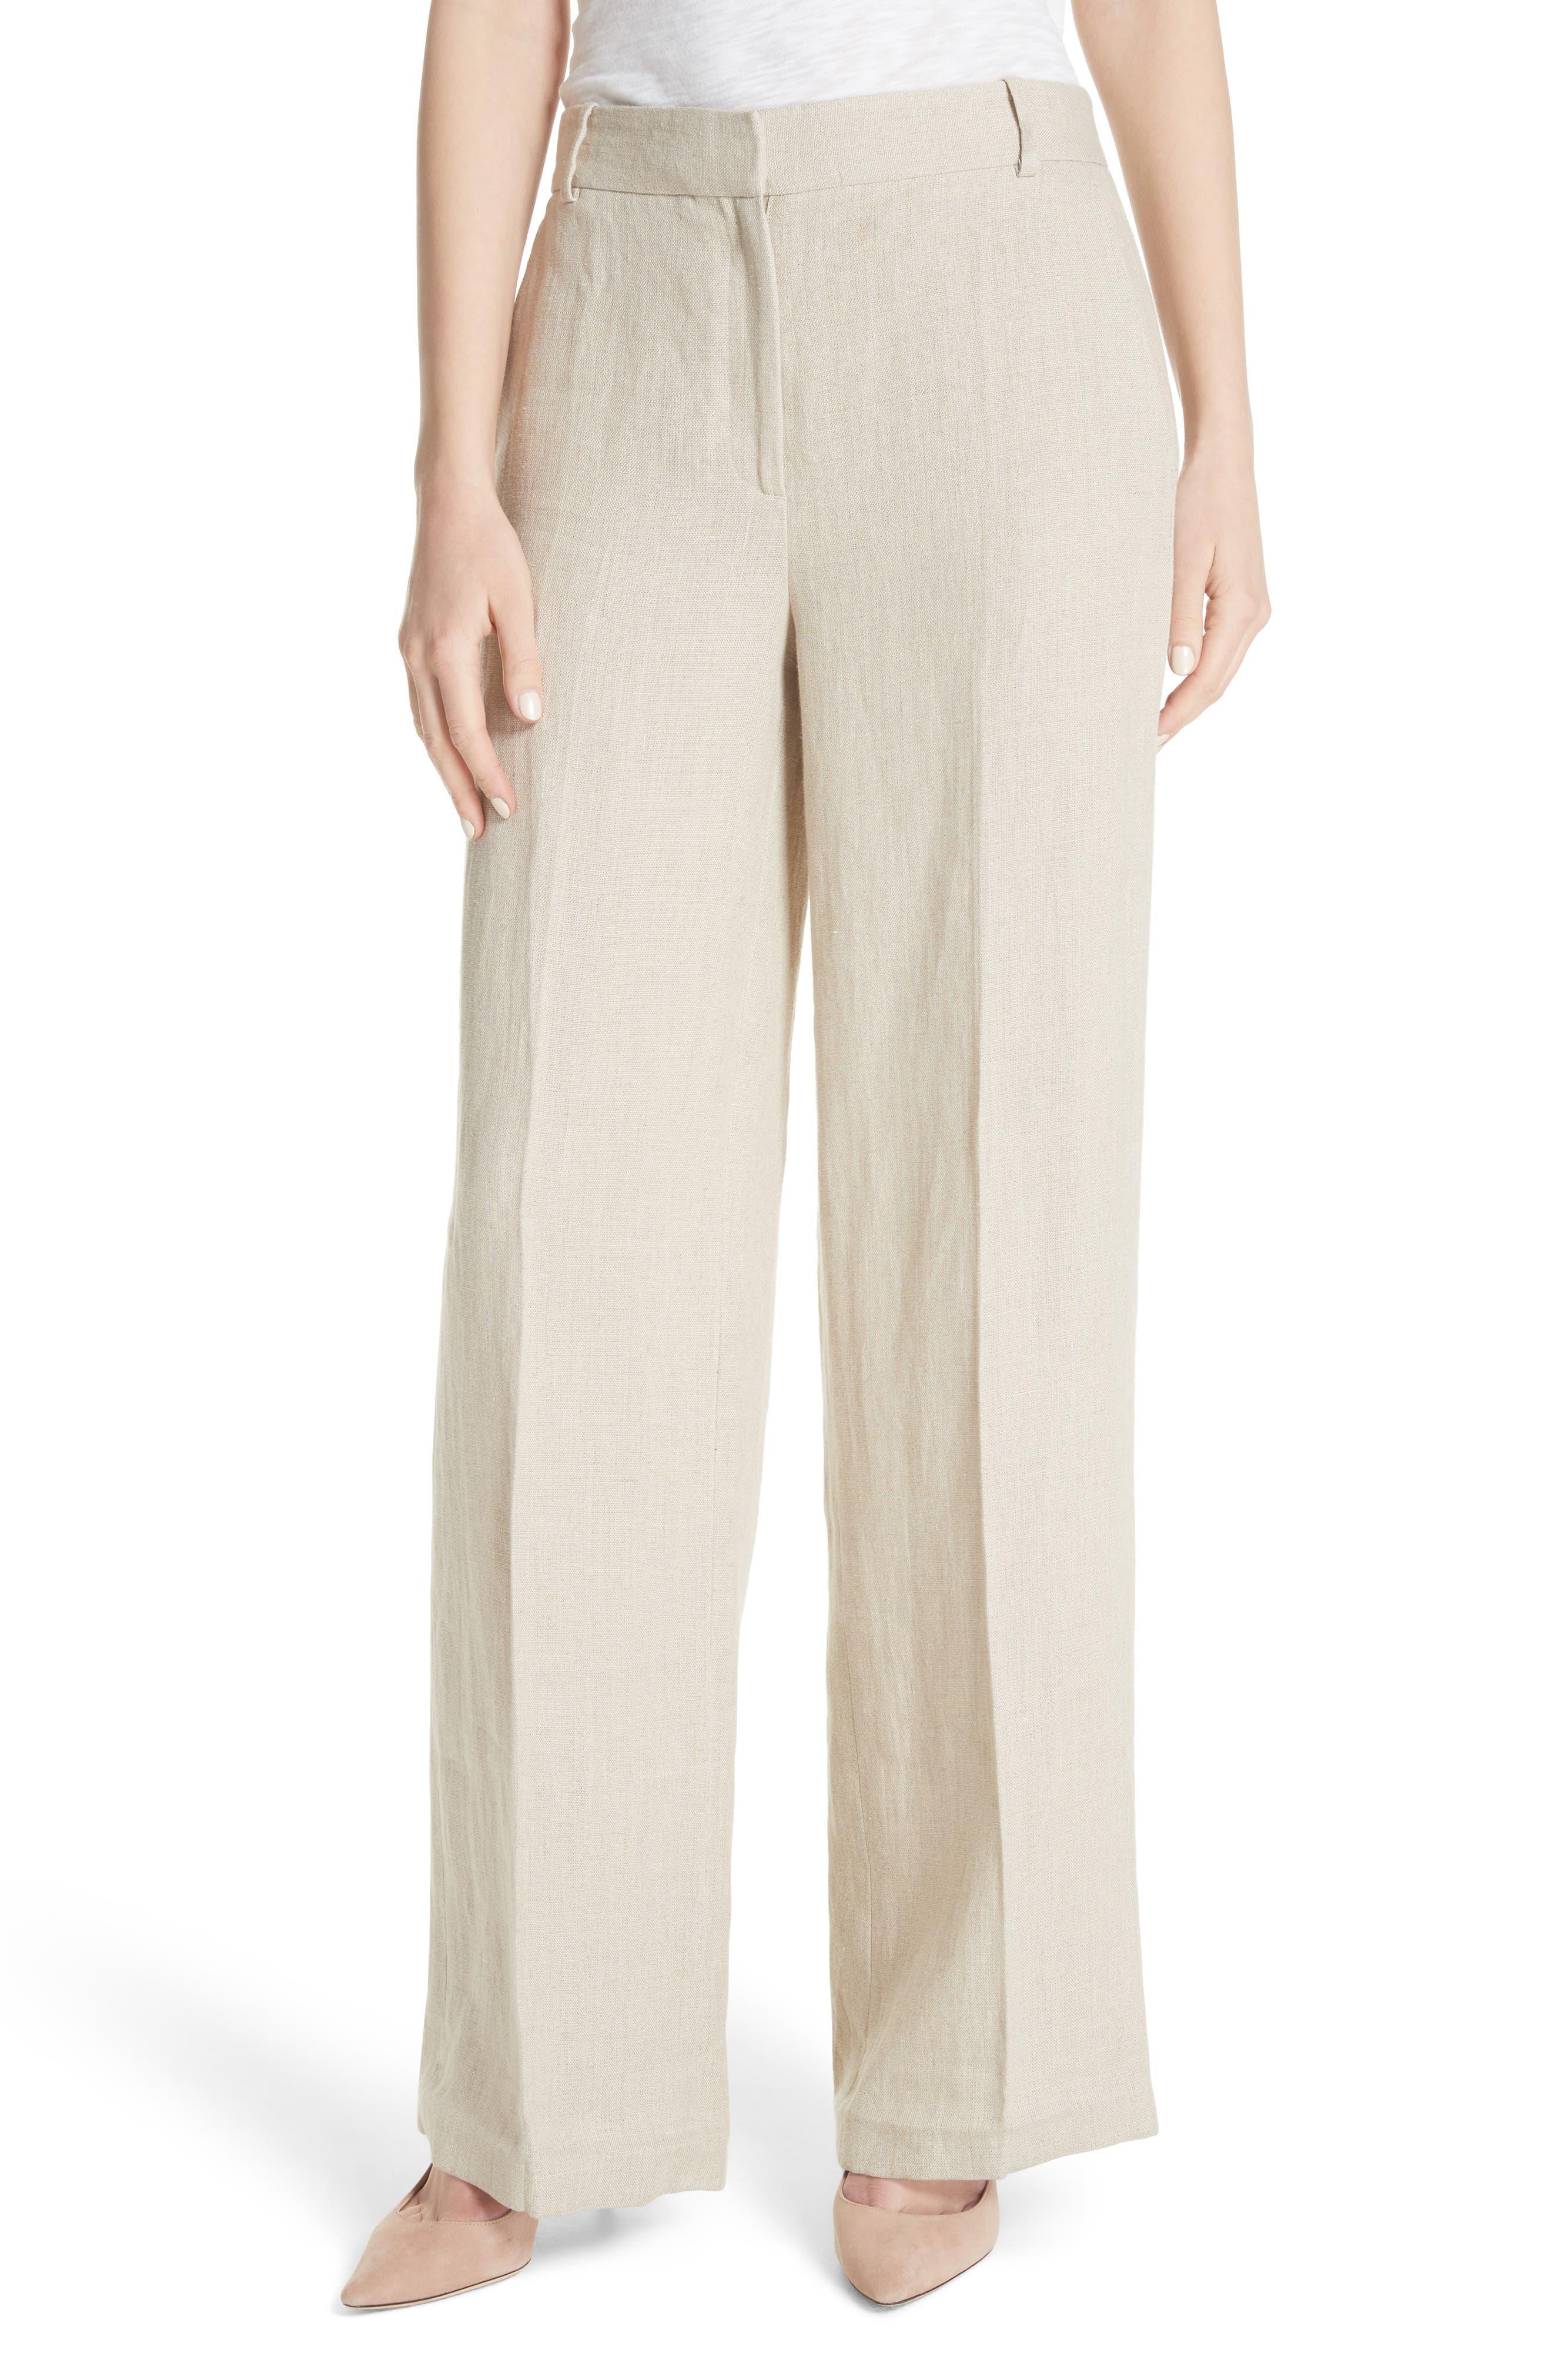 Piazza Integrate Wide Leg Linen Pants,                         Main,                         color, Falx